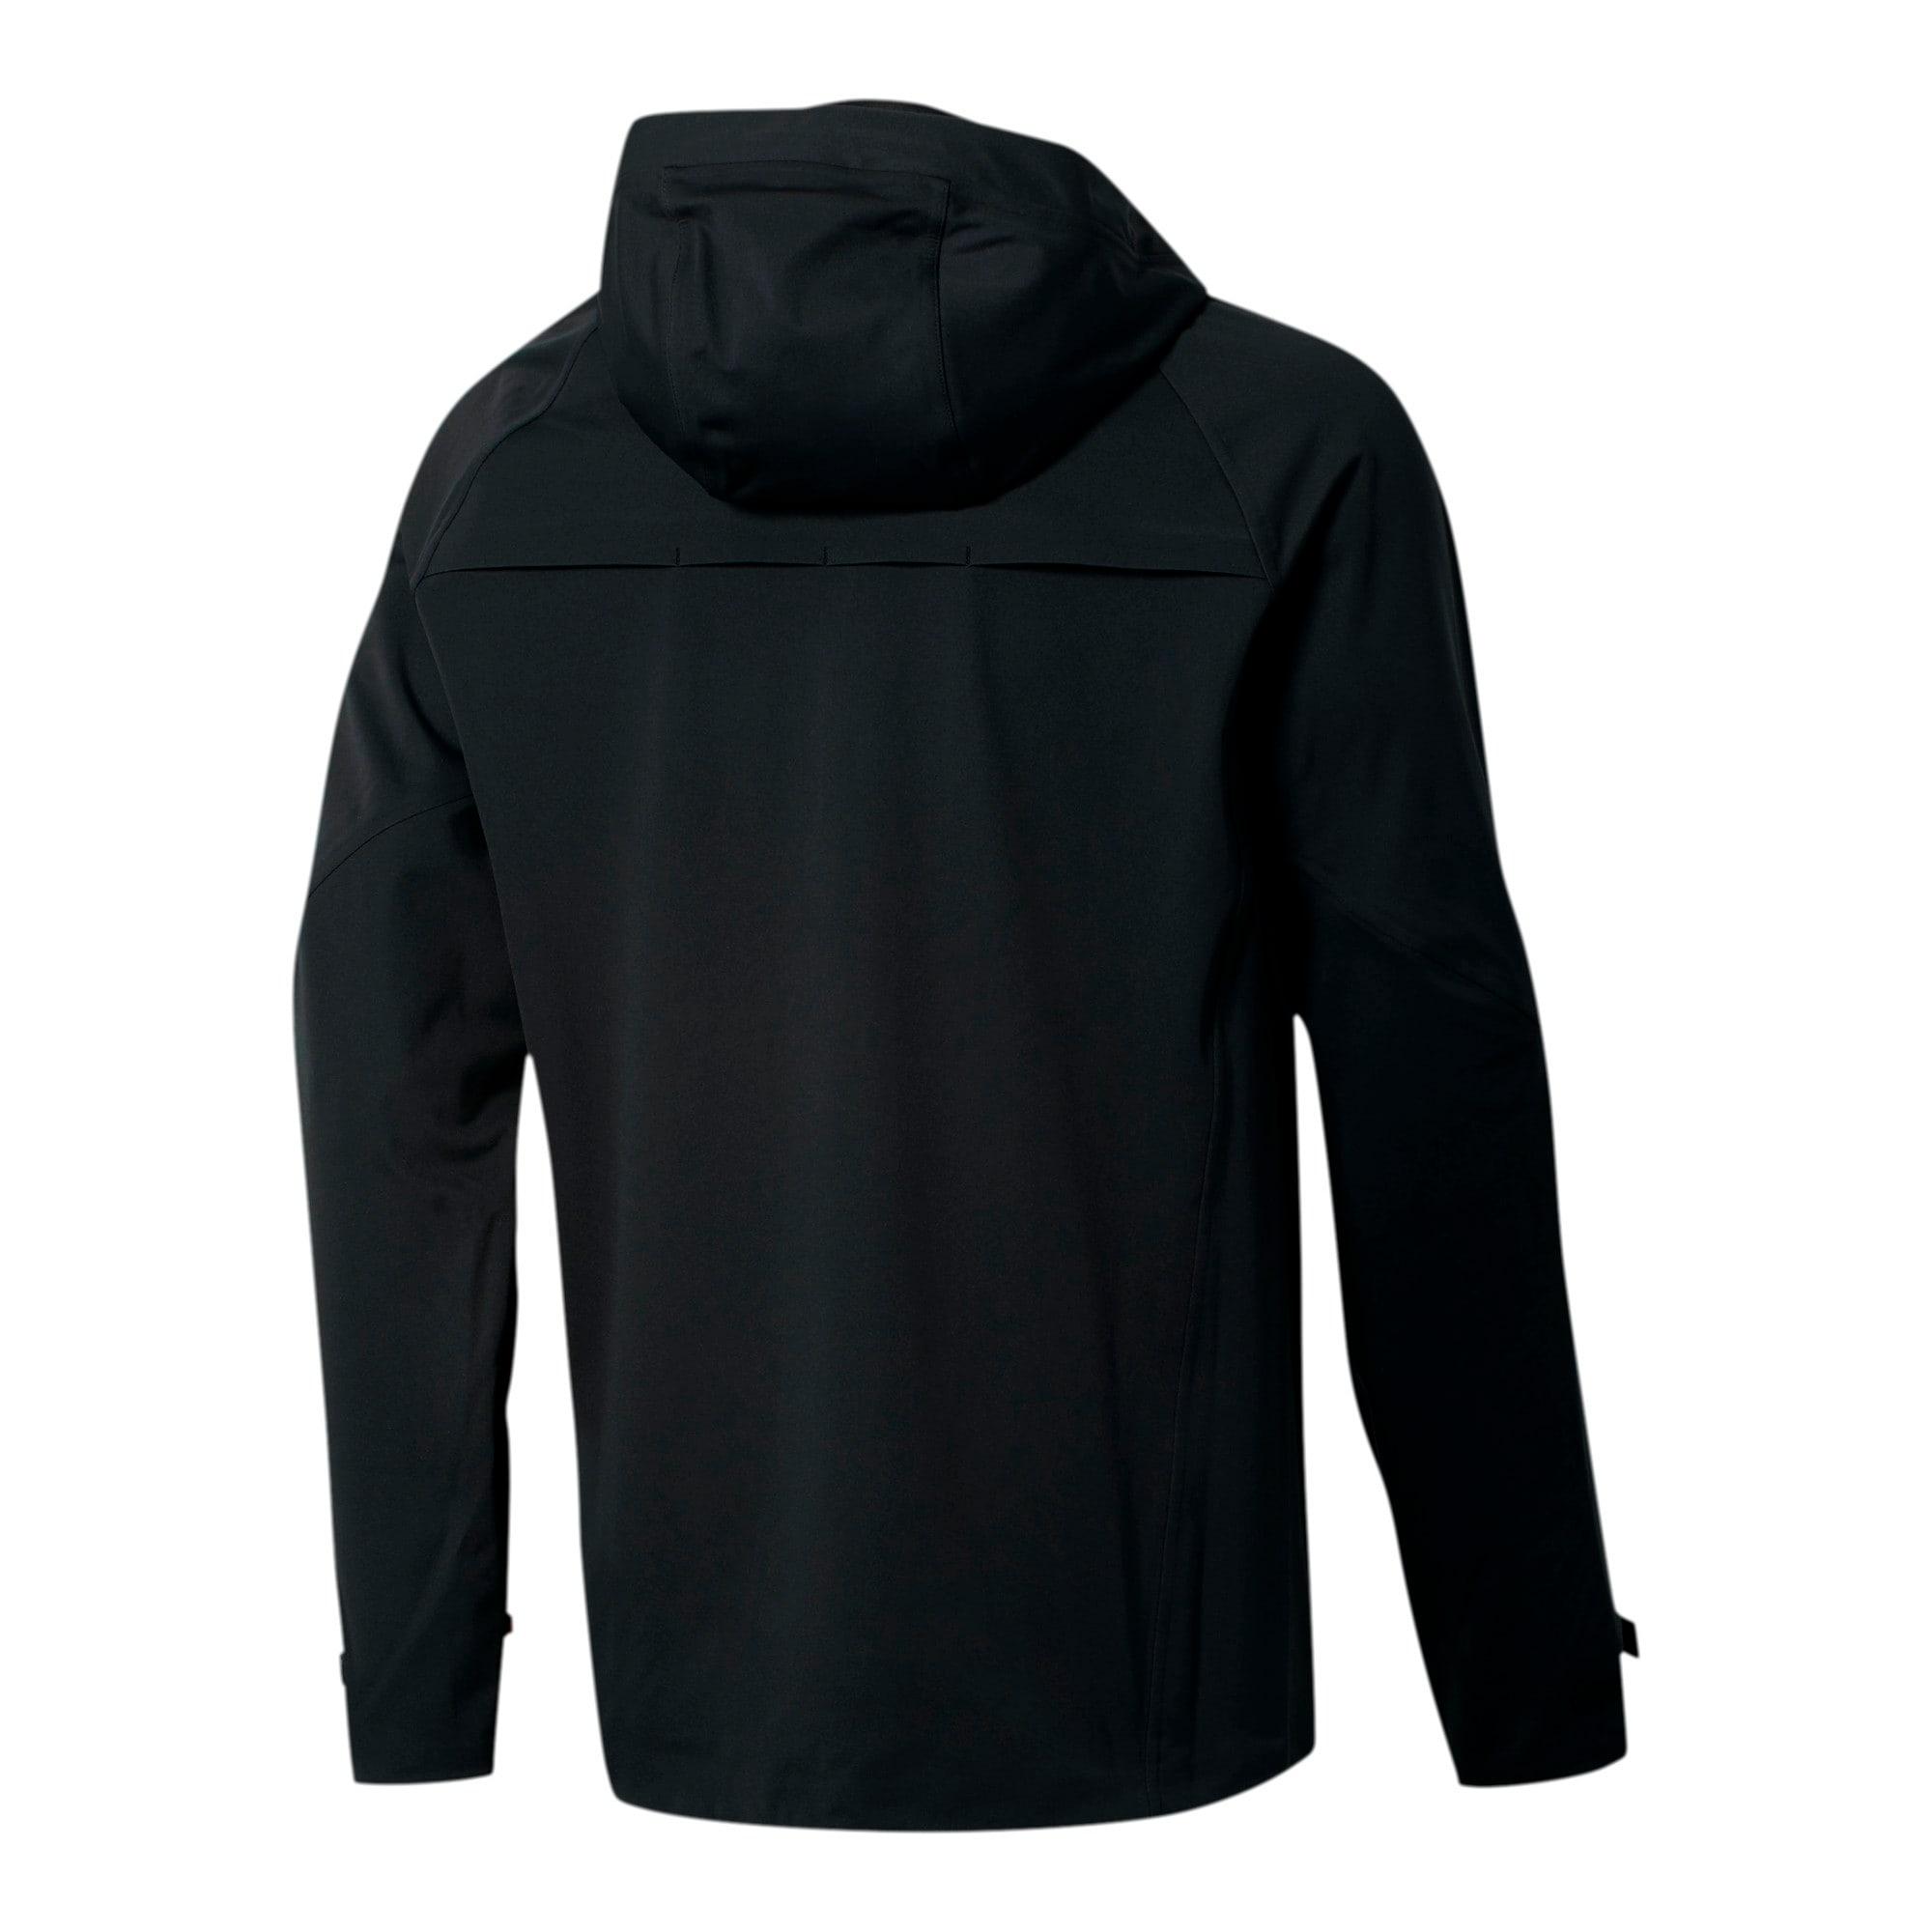 Thumbnail 5 of Porsche Design Active All Day Men's Jacket, Jet Black, medium